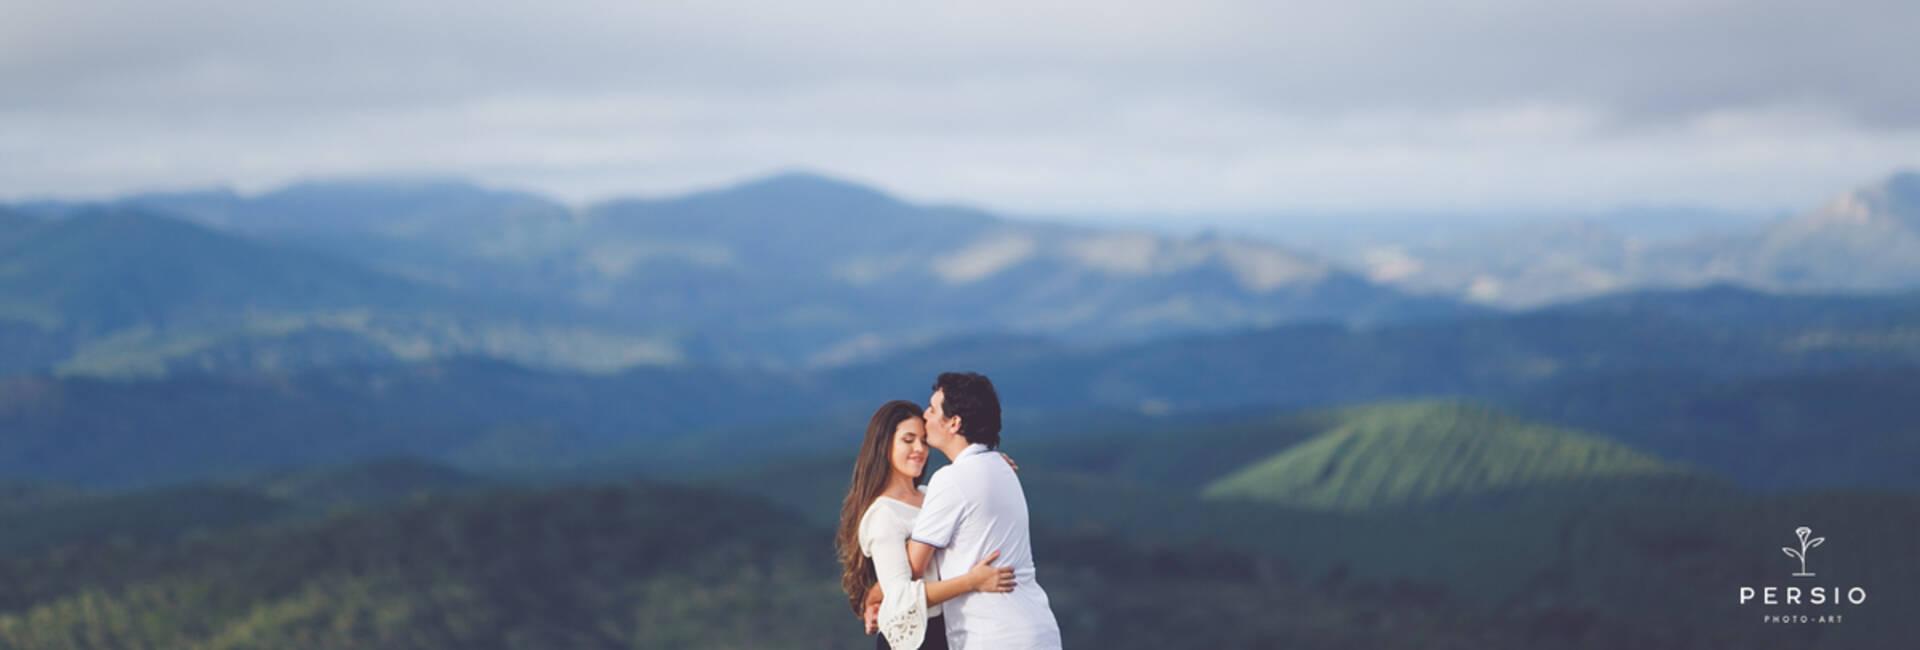 Ensaio Pre Wedding de Daianara e Adriel